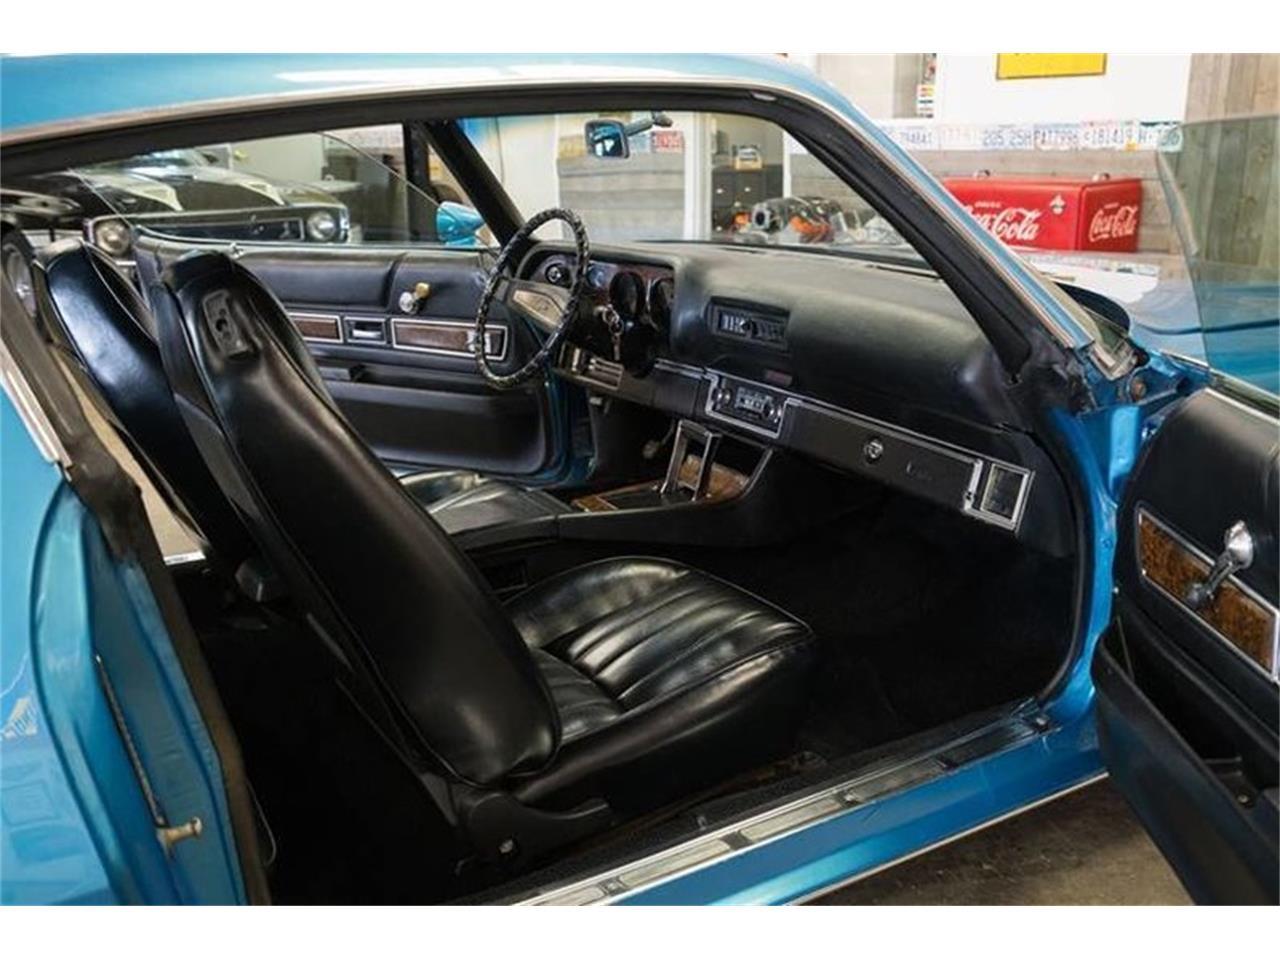 Large Picture of '70 Camaro located in Grand Rapids Michigan - $31,990.00 - LD3M